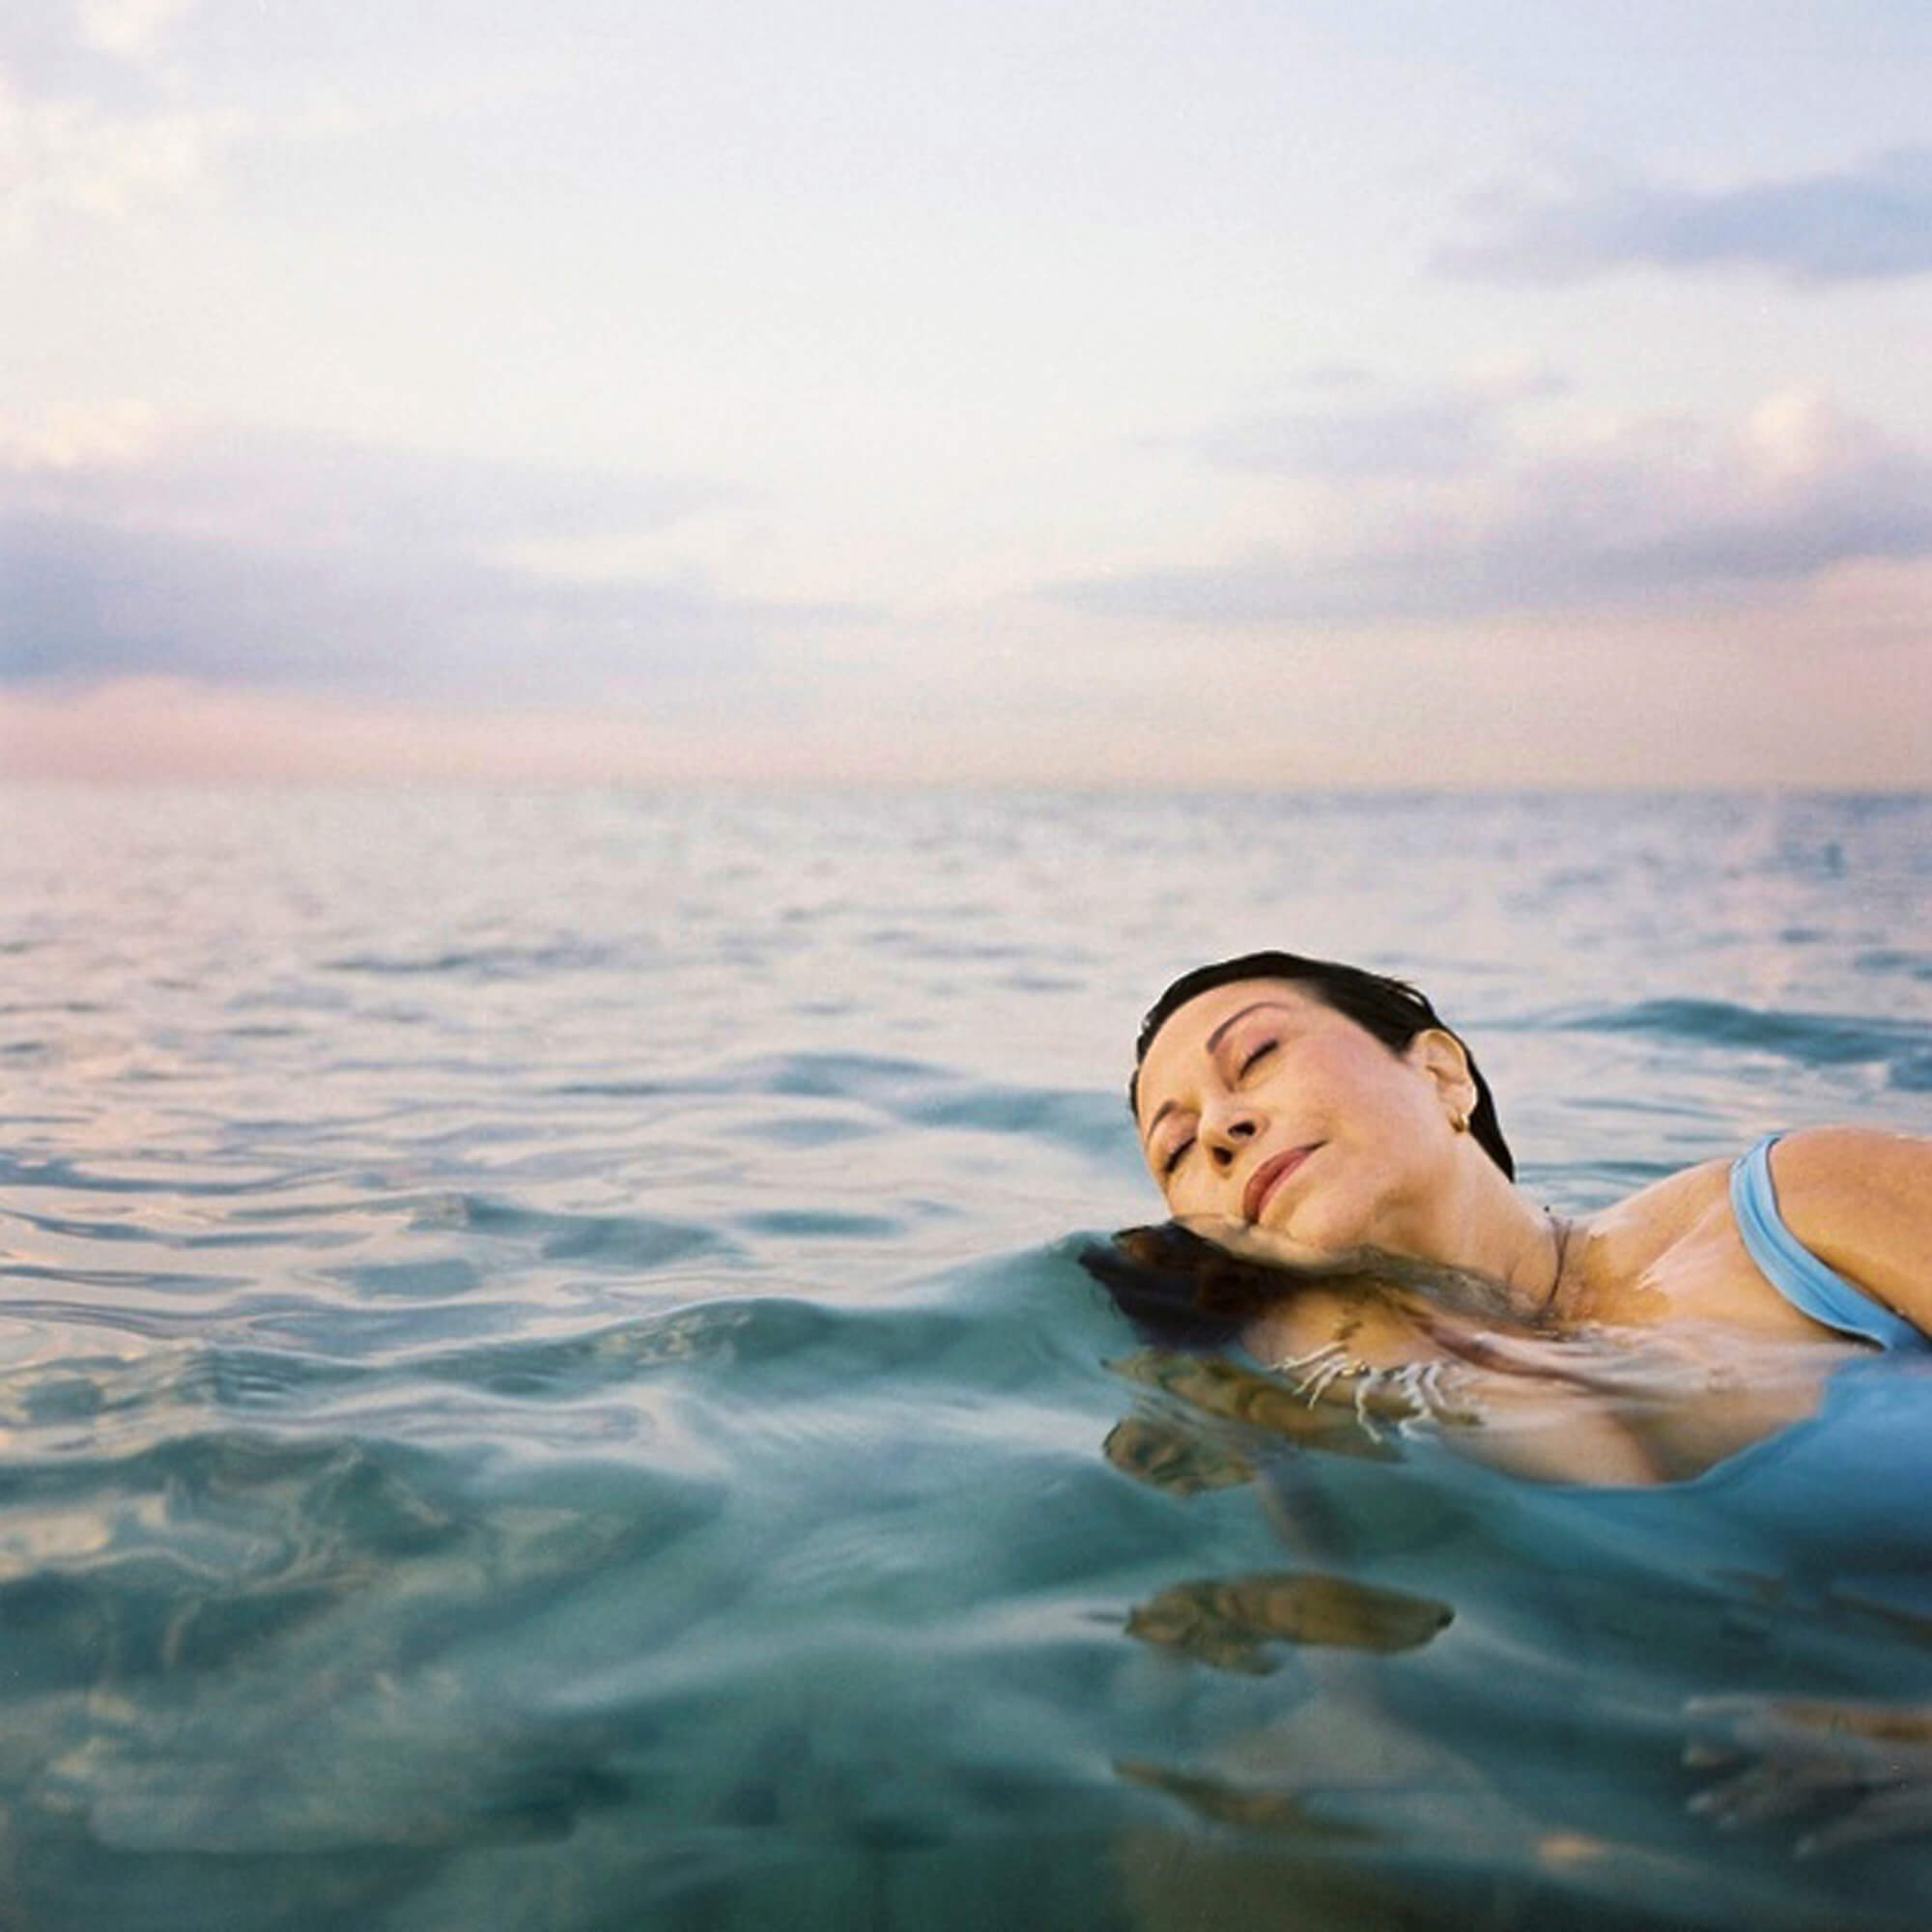 Steber_Swimming-in-sea-of-memories